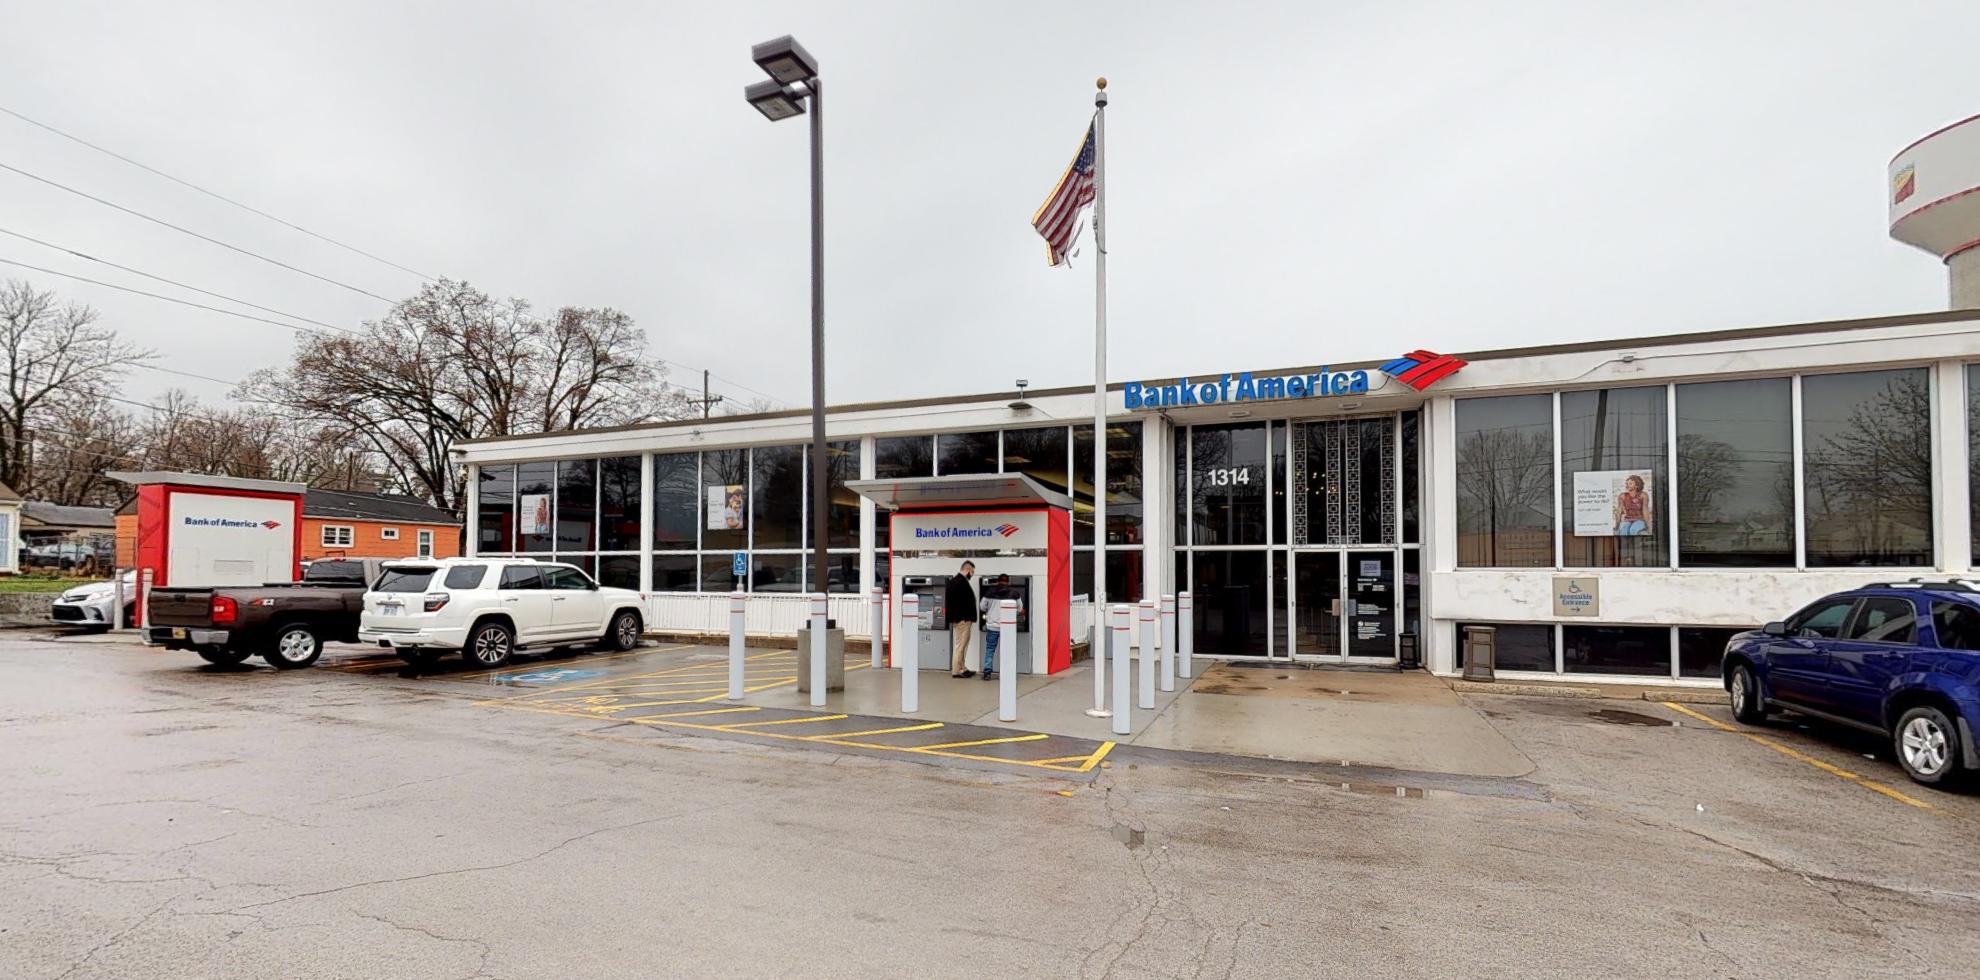 Bank of America financial center with drive-thru ATM | 1314 N 38th St, Kansas City, KS 66102